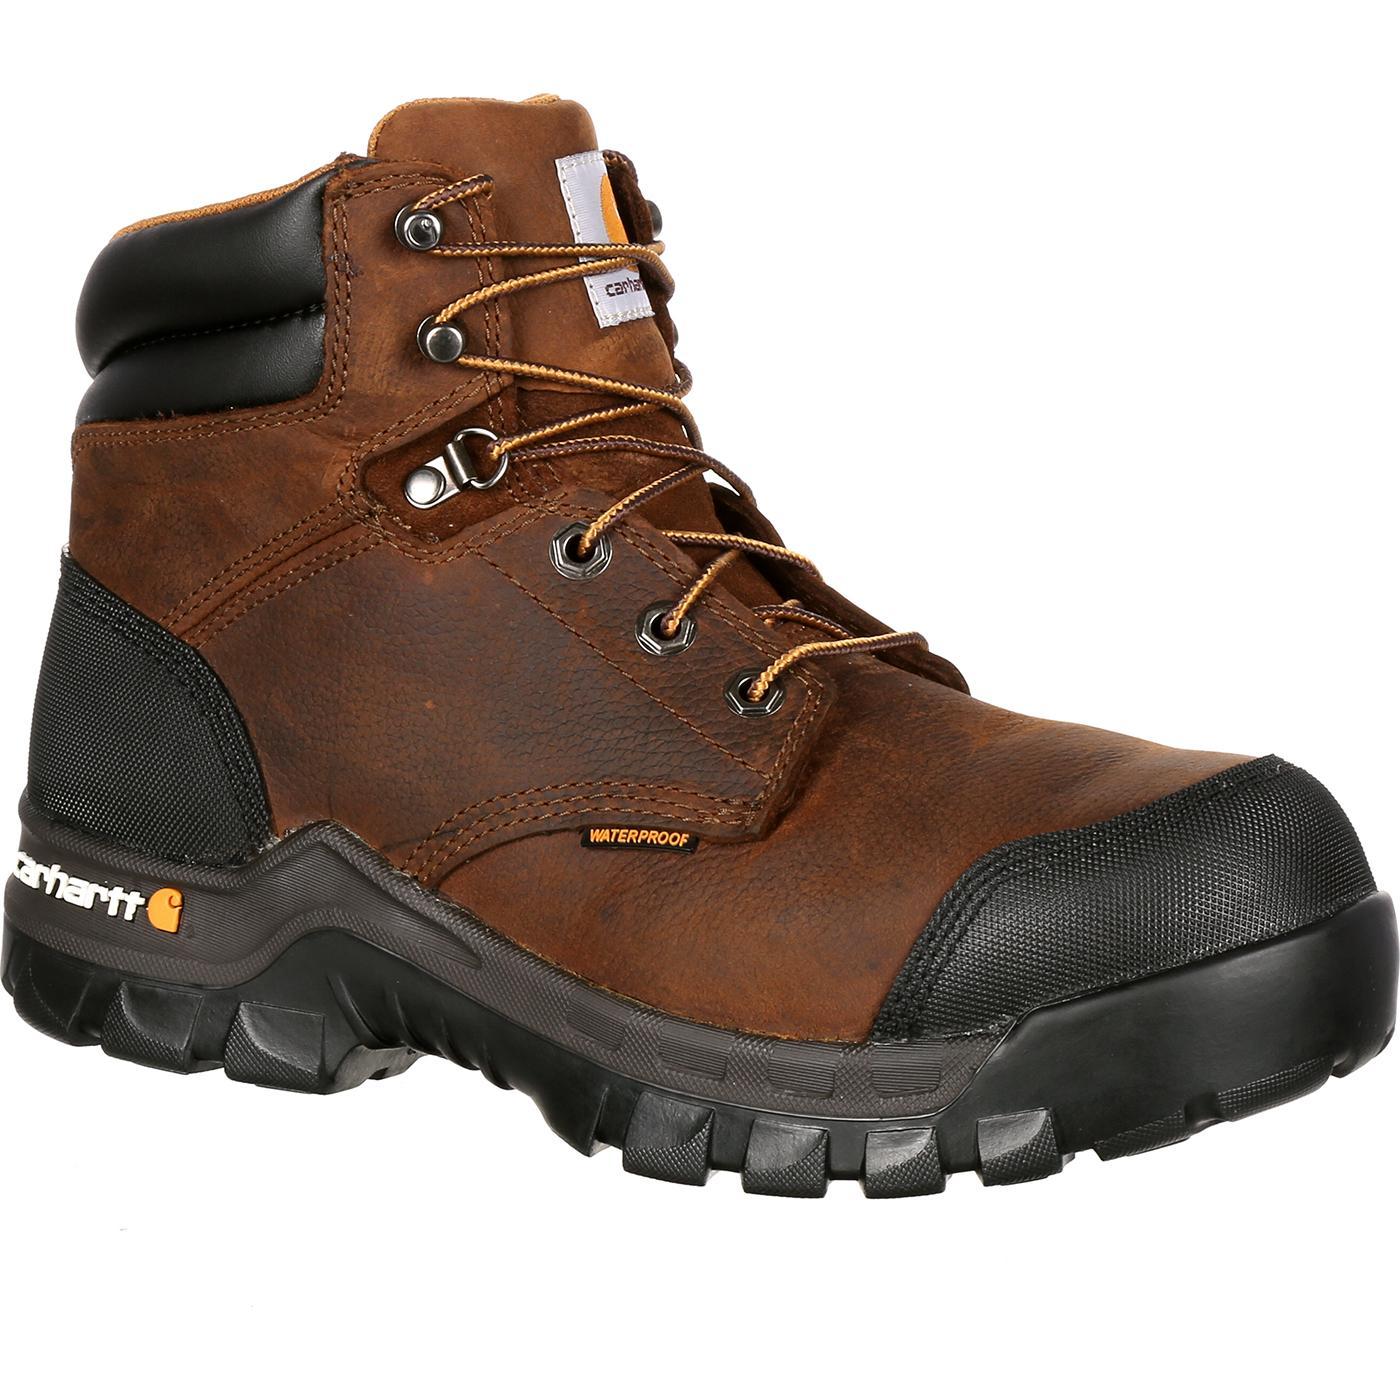 Carhartt Rugged Flex Ct Waterproof Work Boot Cmf6380